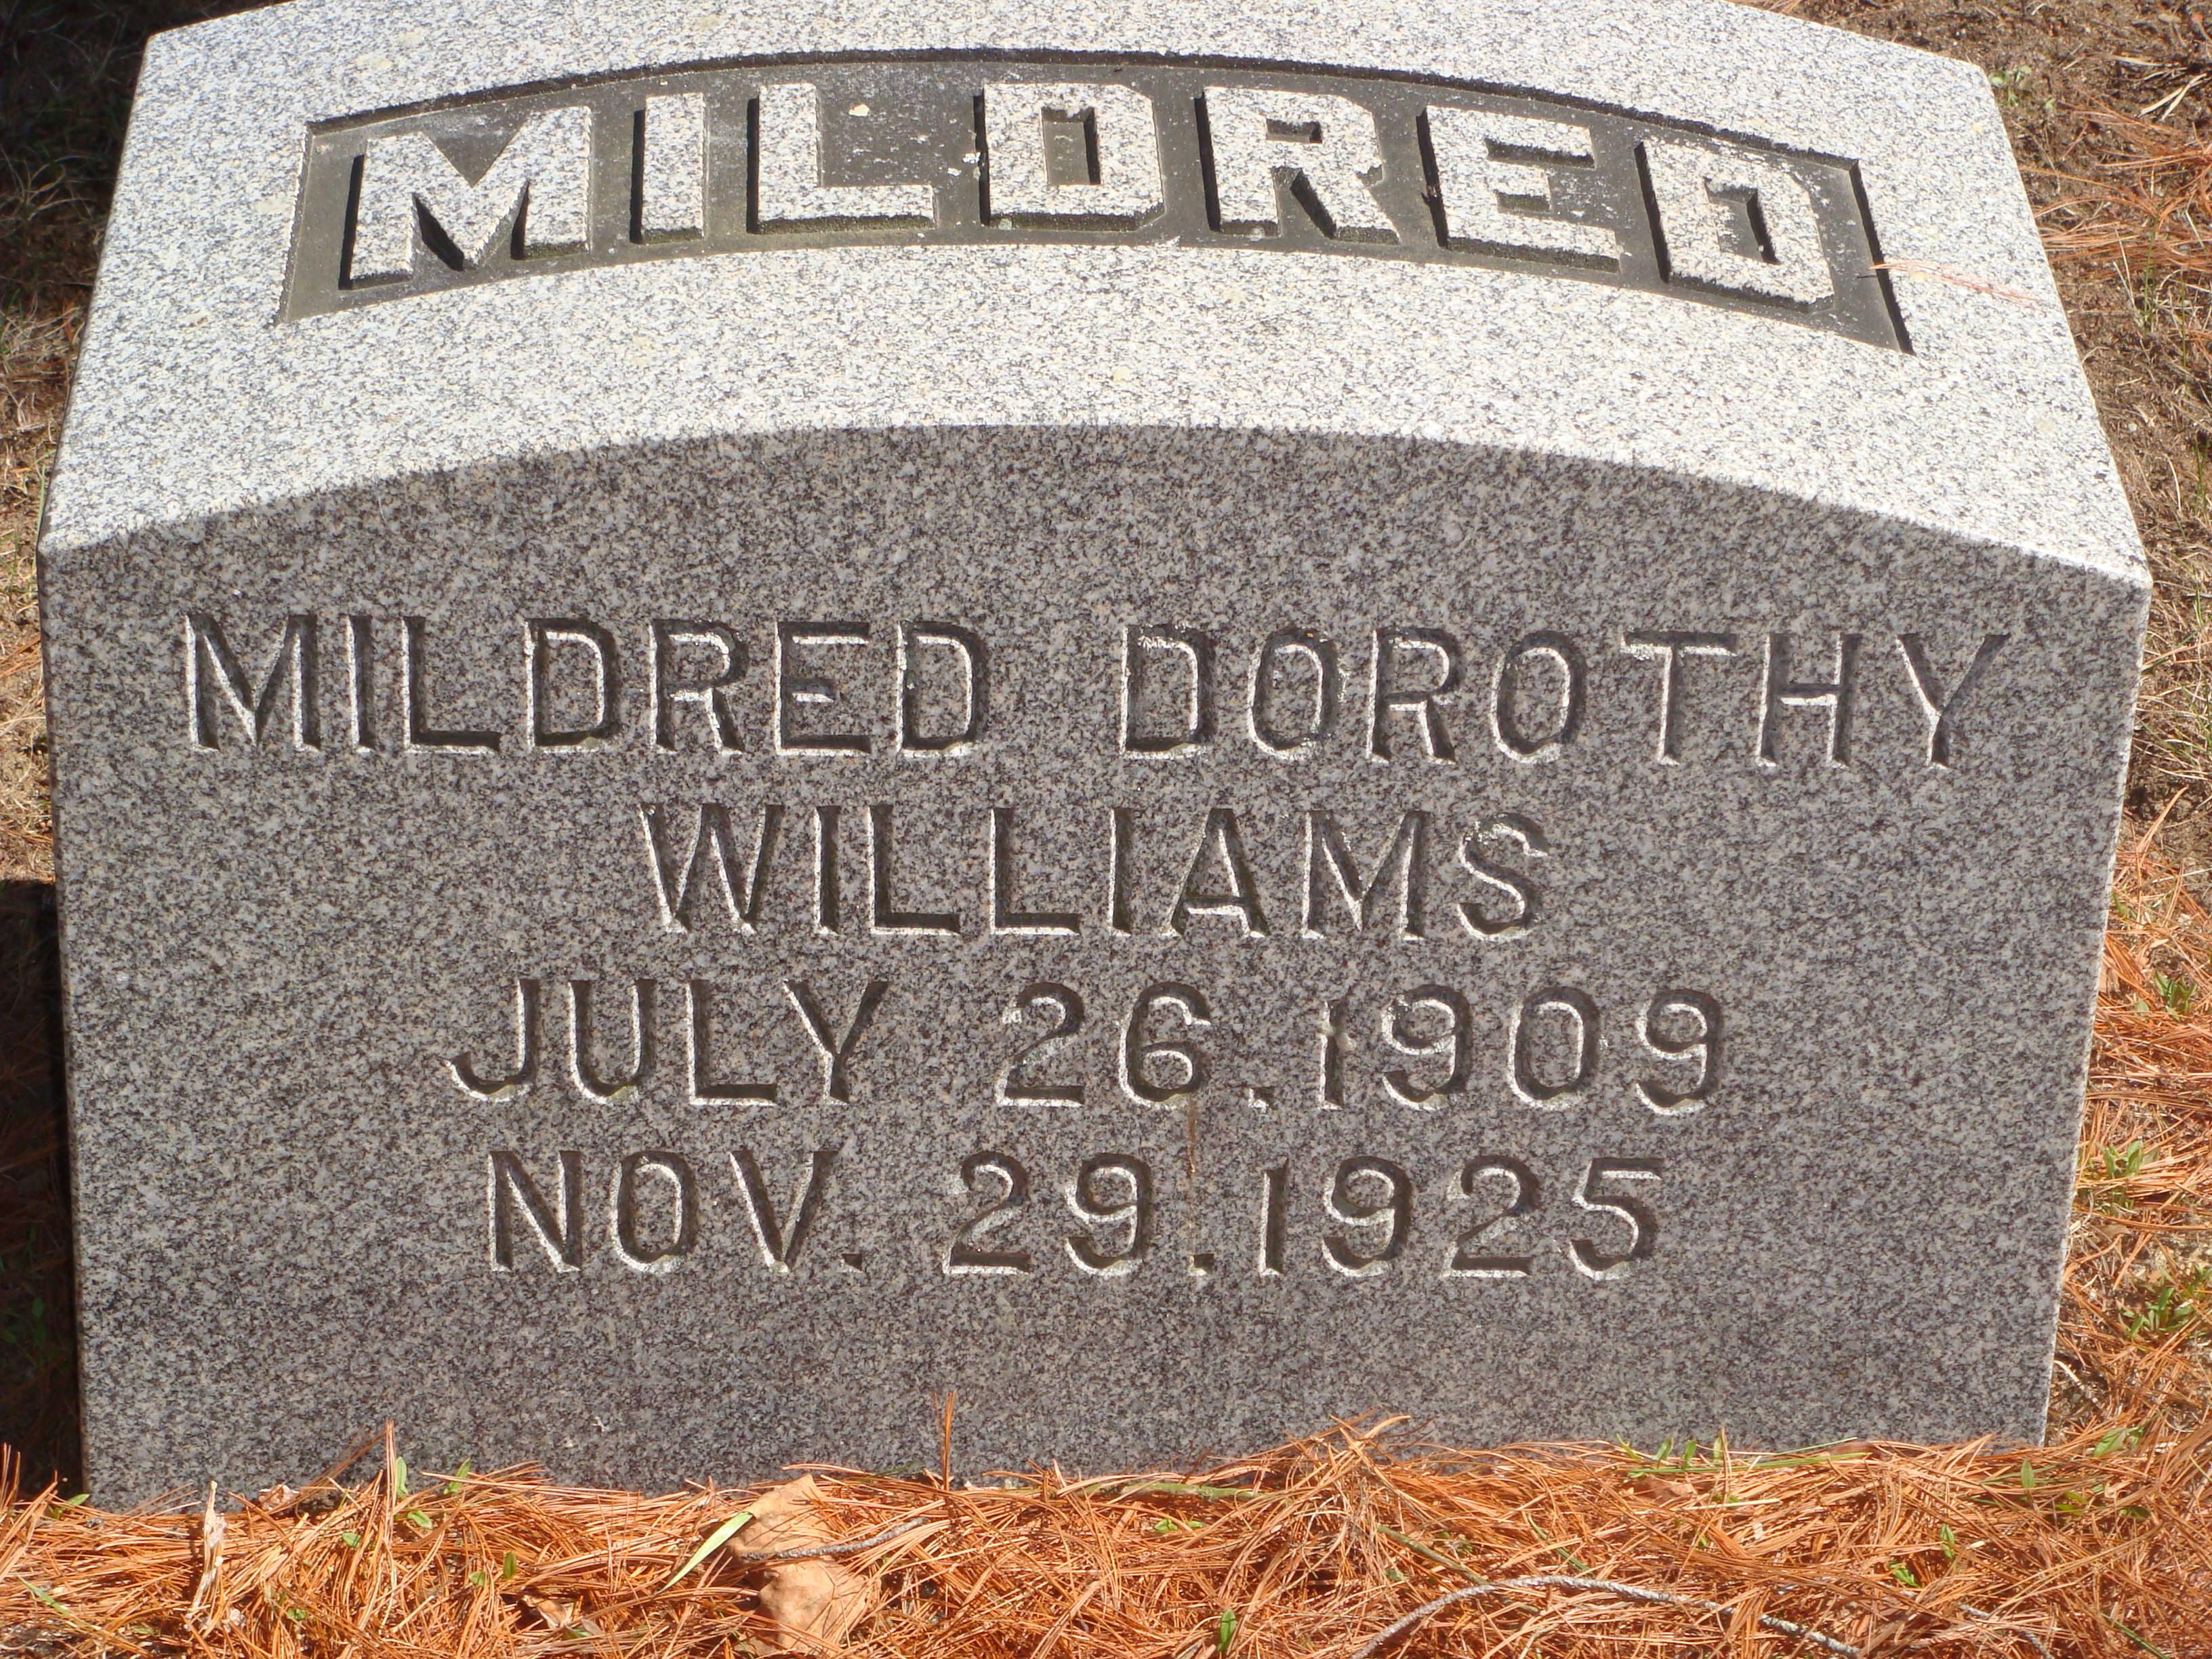 Mildred Dorothy Williams